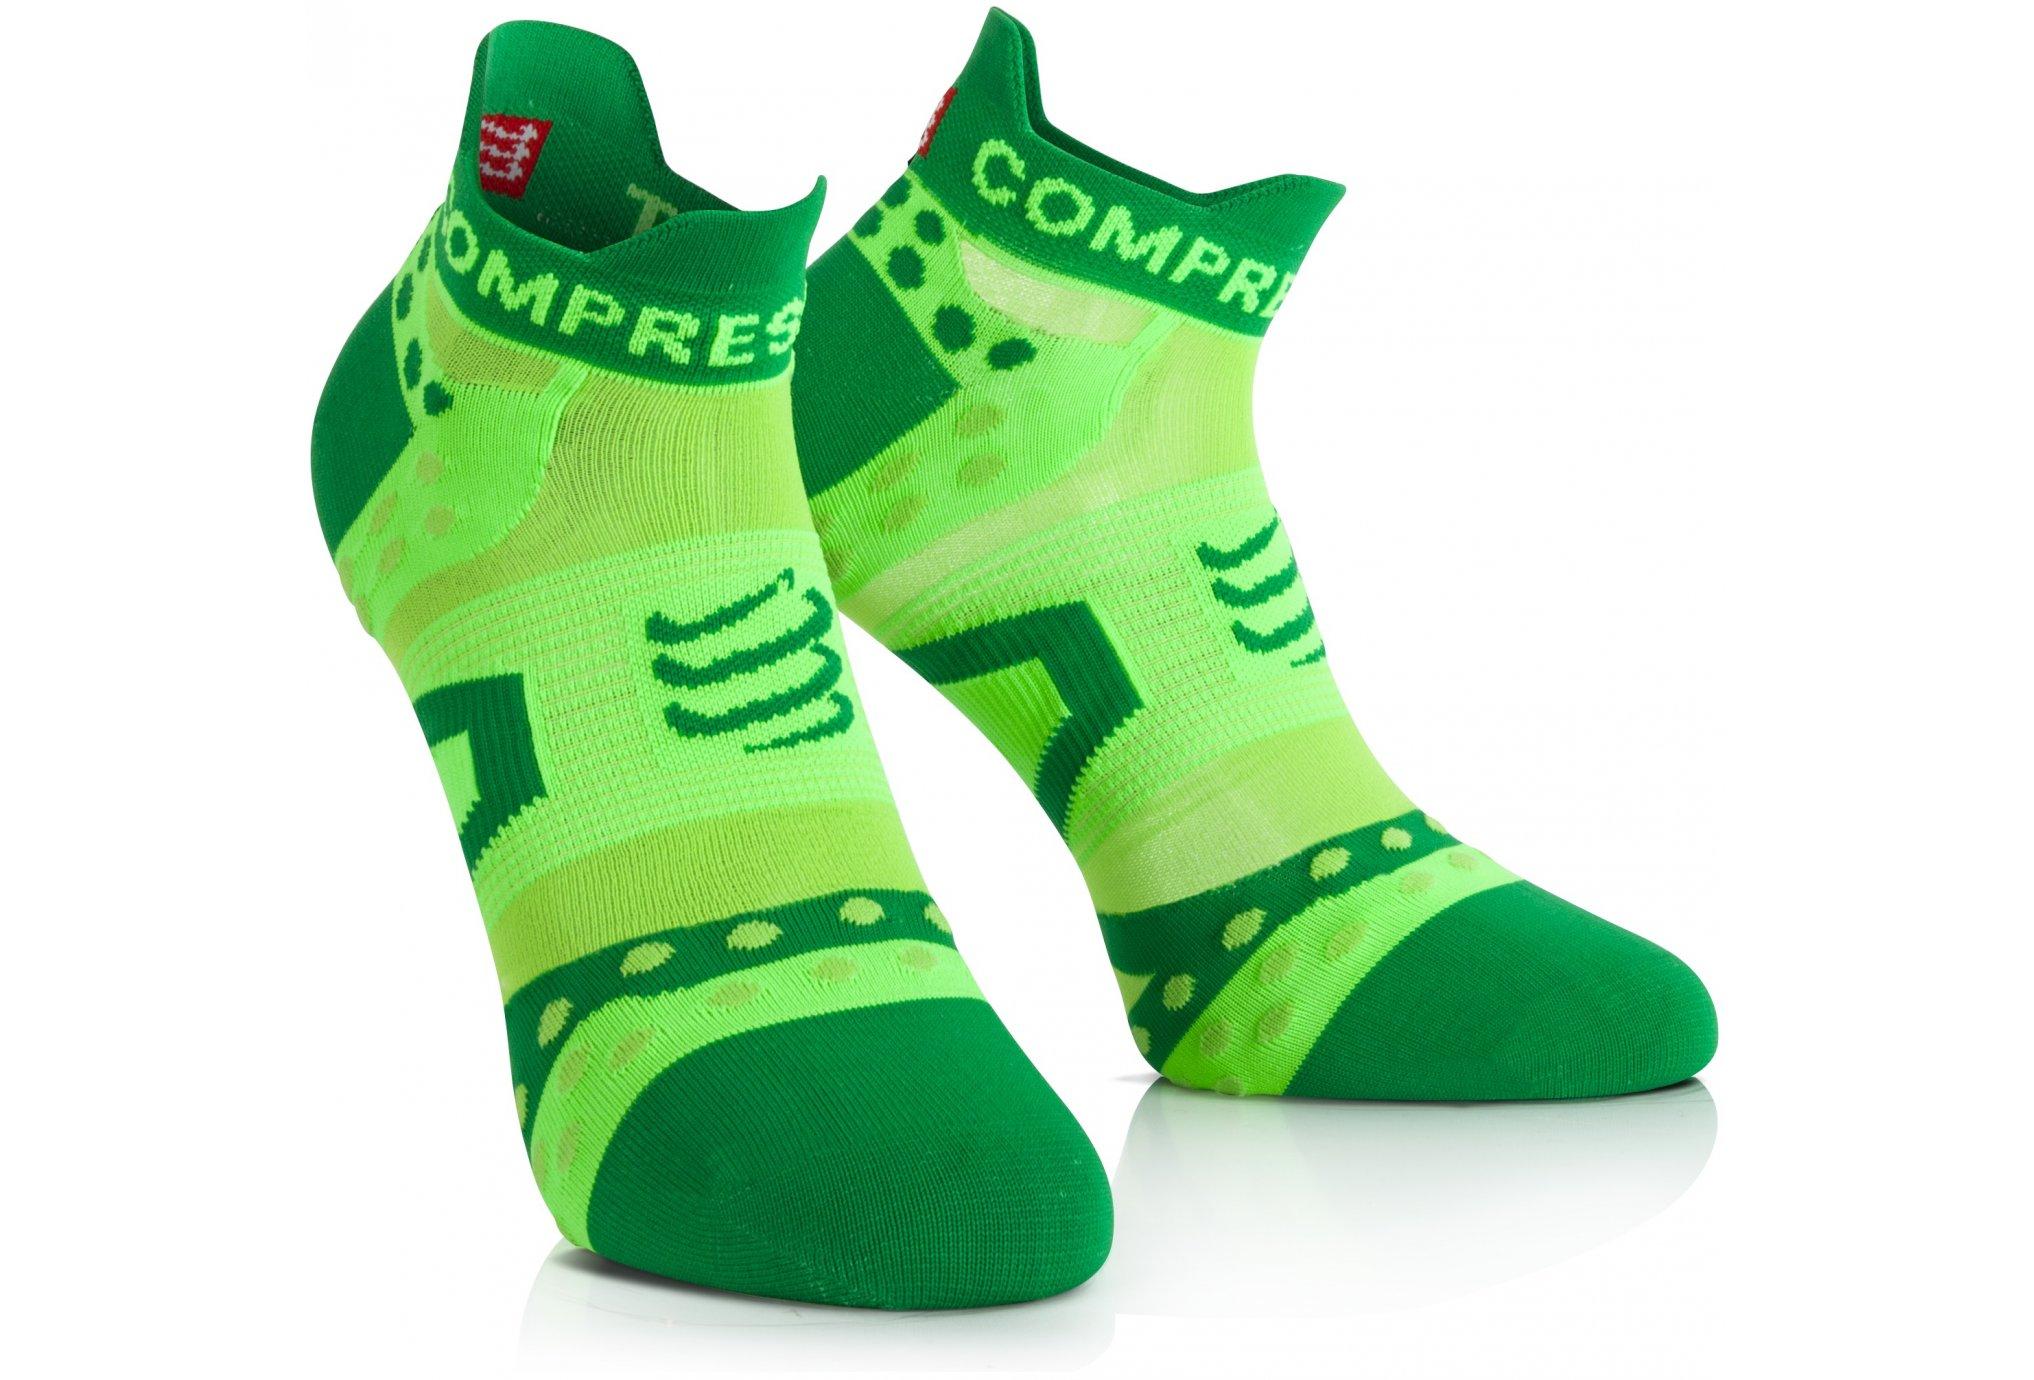 Compressport Pro Racing Ultra Light Low Cut Chaussettes